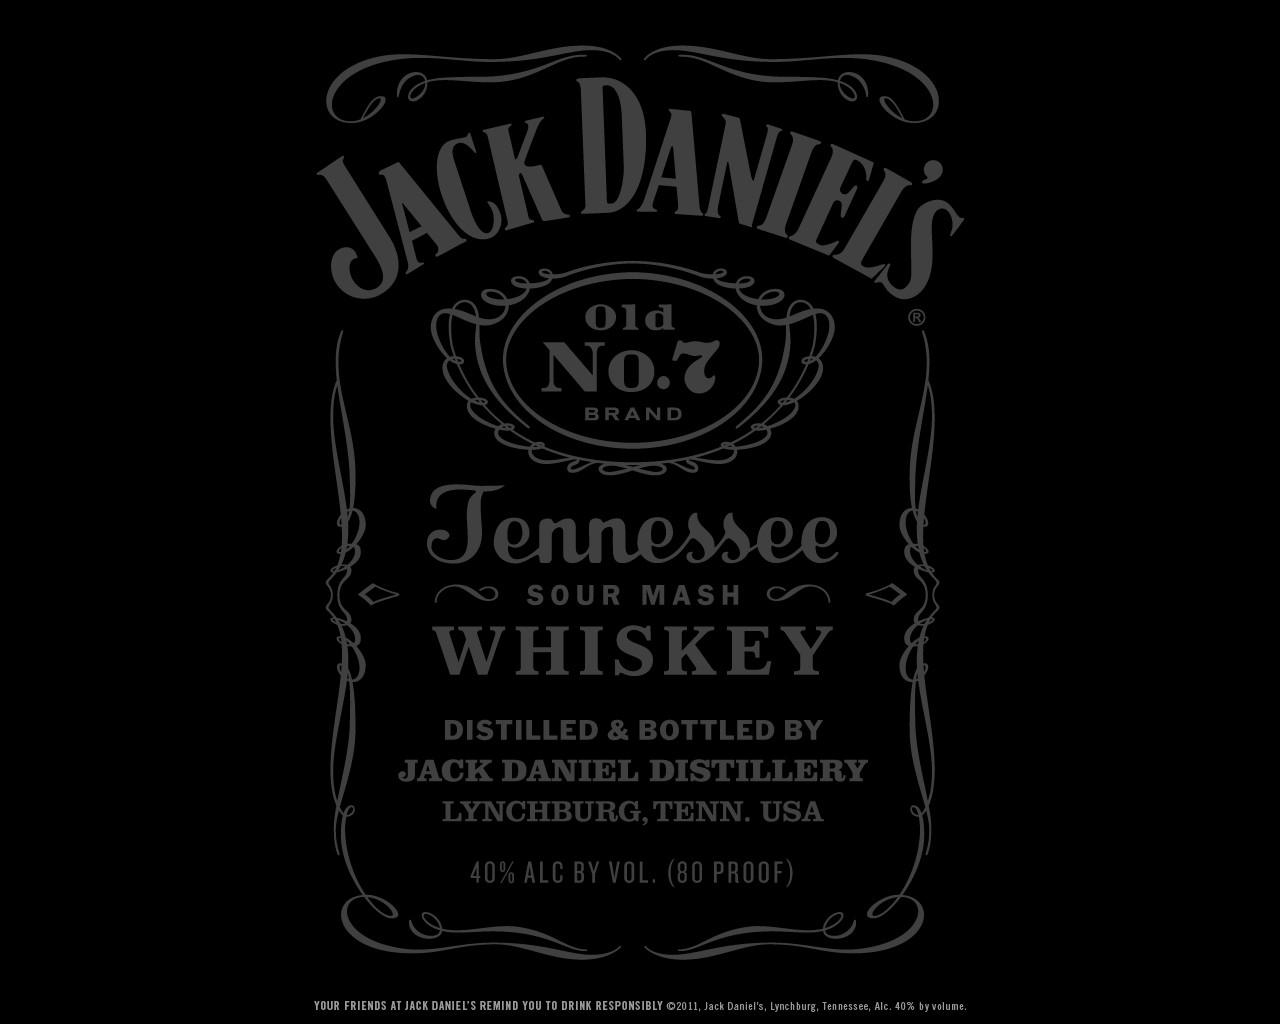 Whiskey Jack Wallpaper 1280x1024 Whiskey Jack Daniels 1280x1024